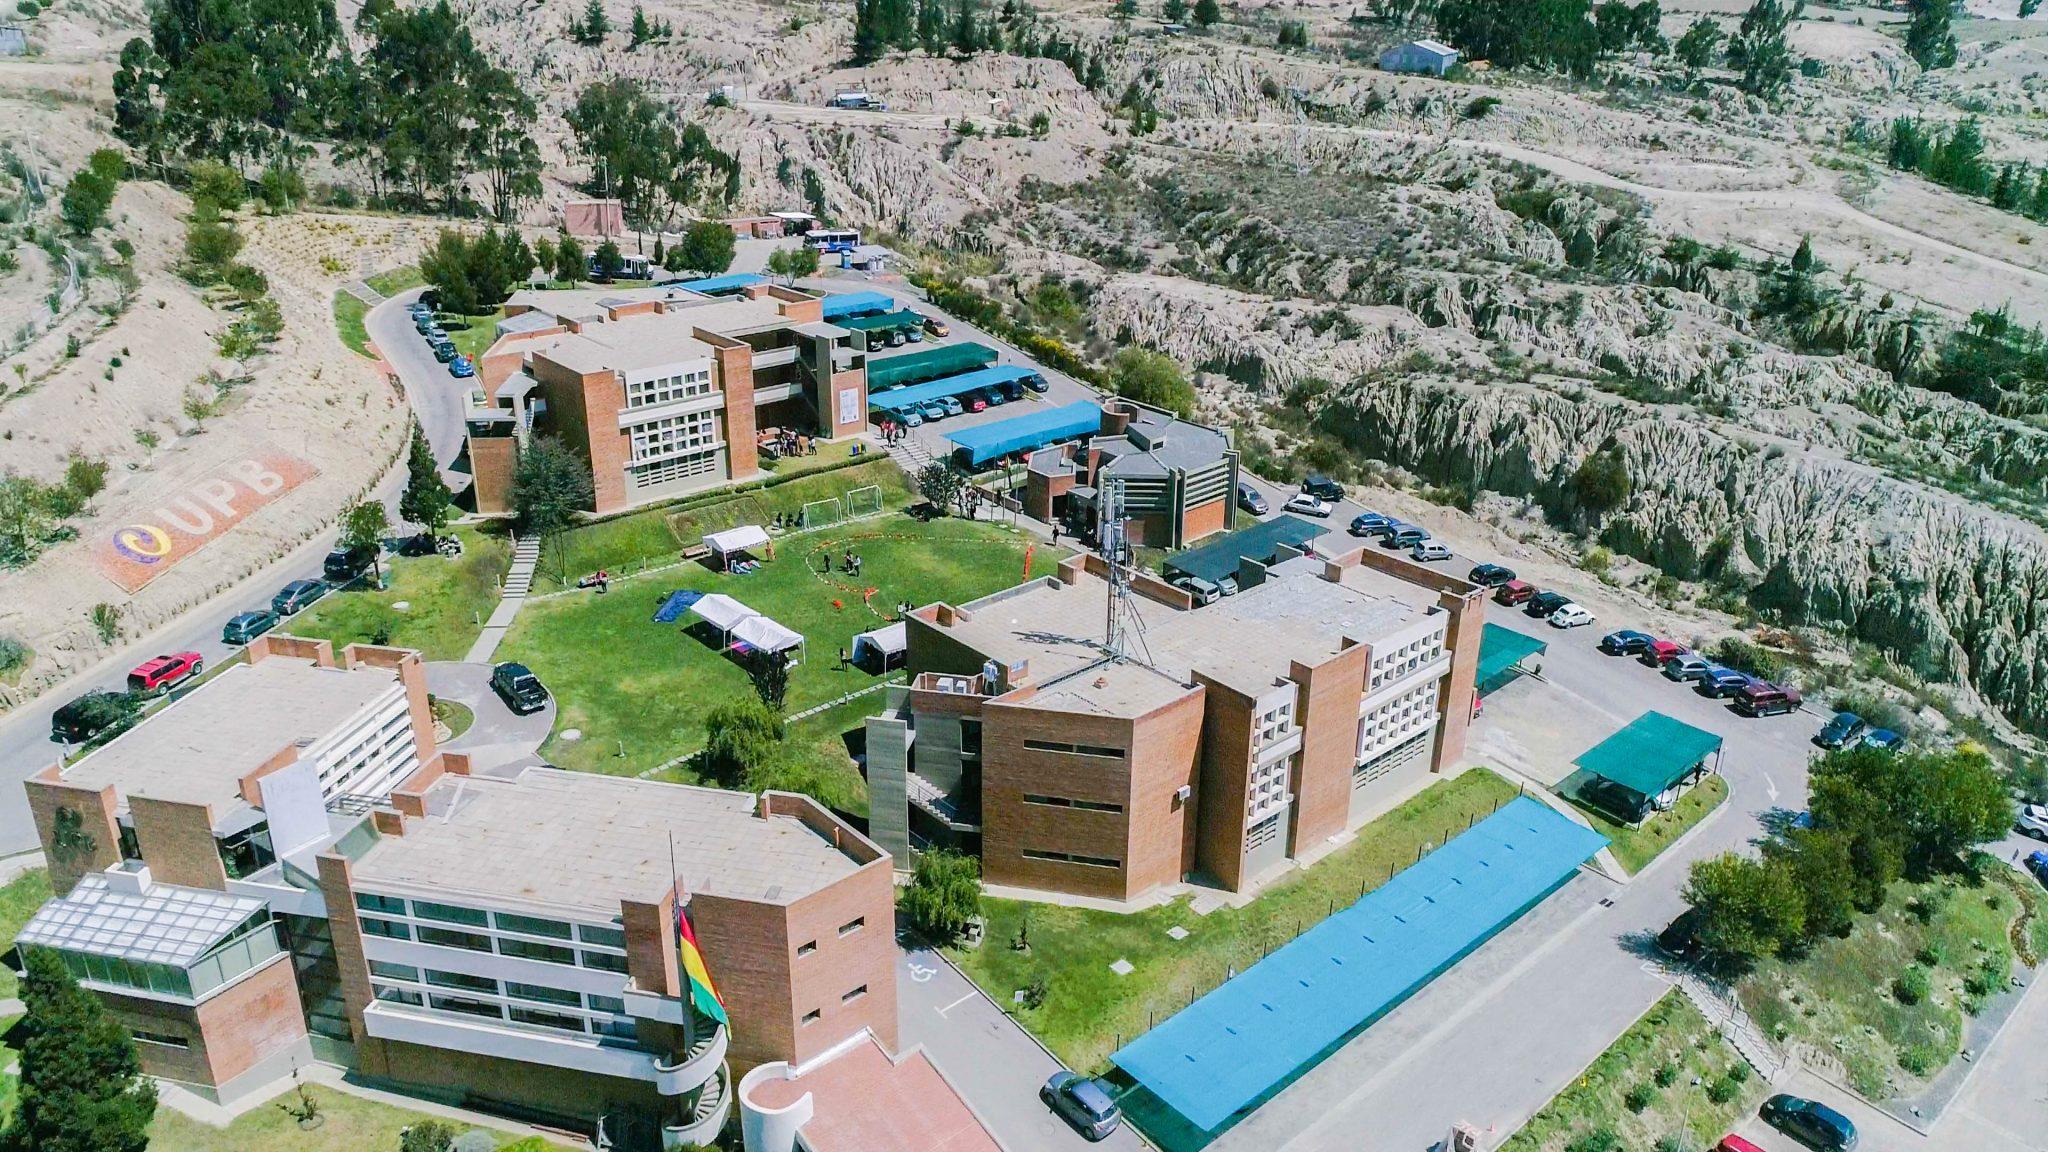 Foto UPB Campus La Paz